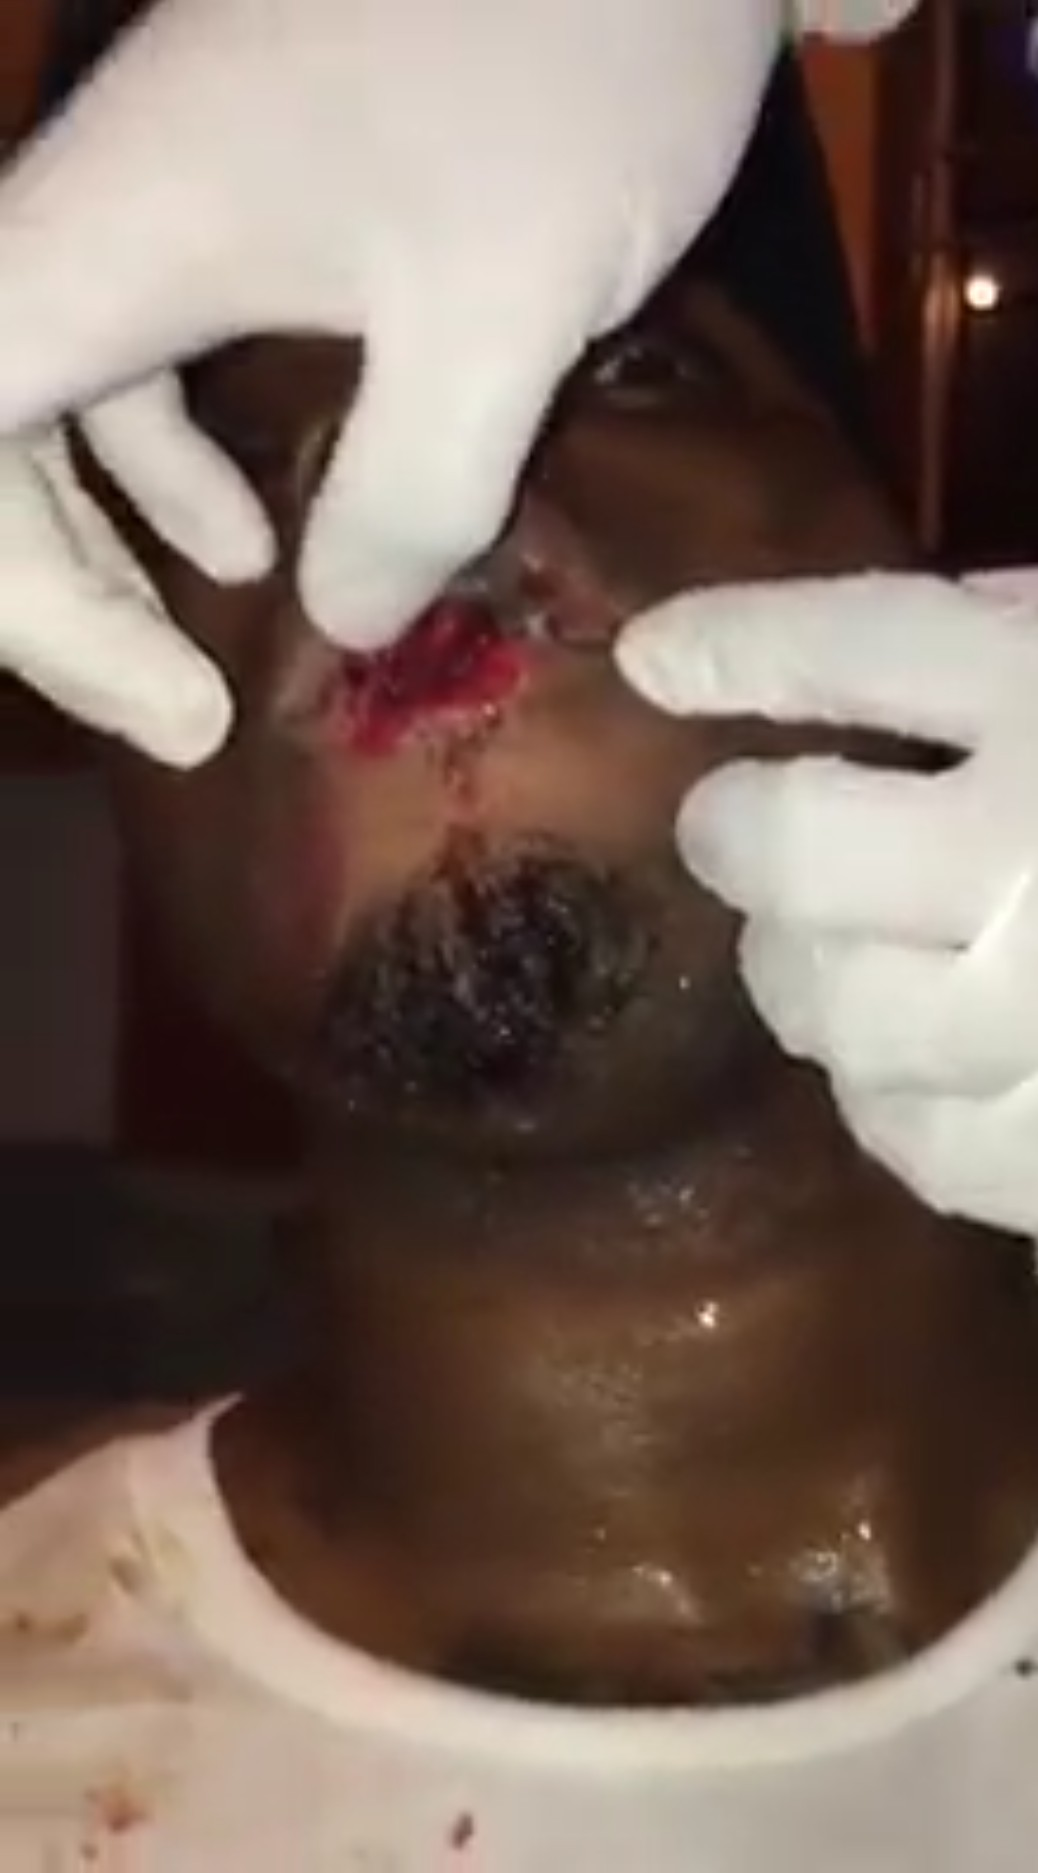 Nigerian Man Who Was Defending His Girlfriend From An Abuser Got His Lips Bitten (4)